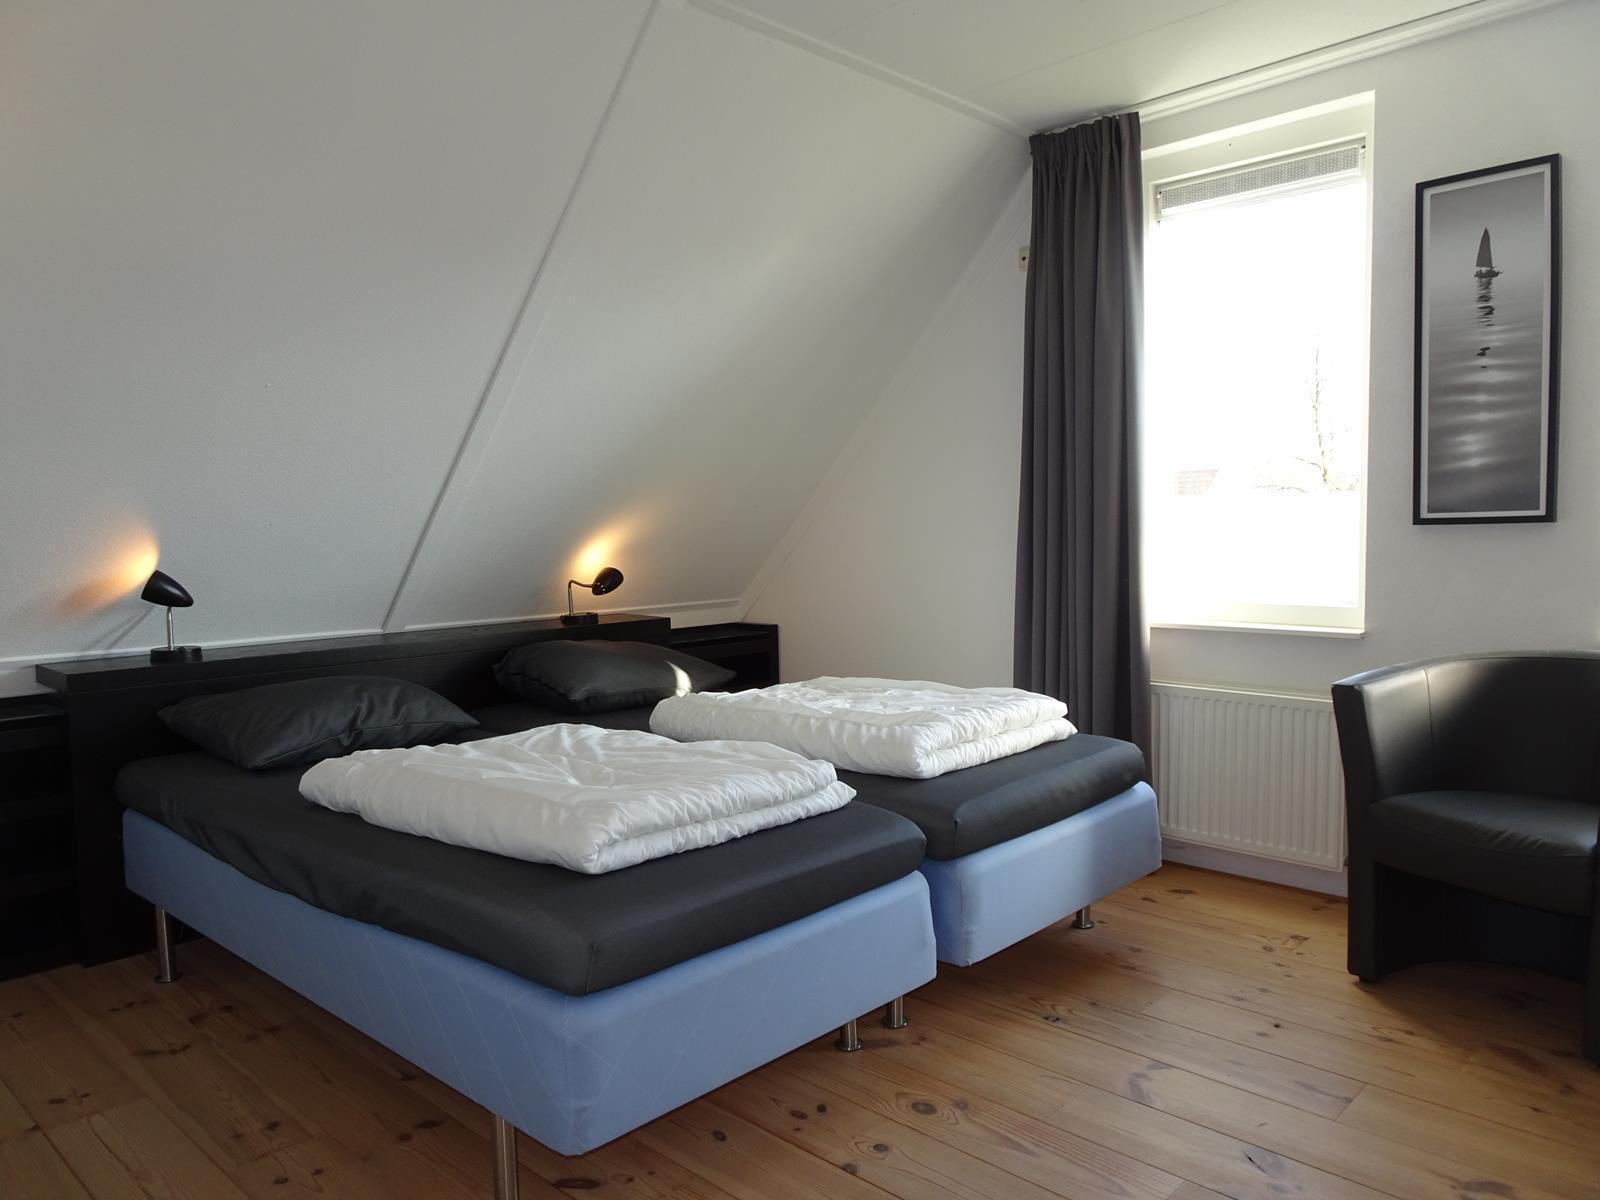 Vakantiehuis te koop Zeeland Bruinisse 008.jpg